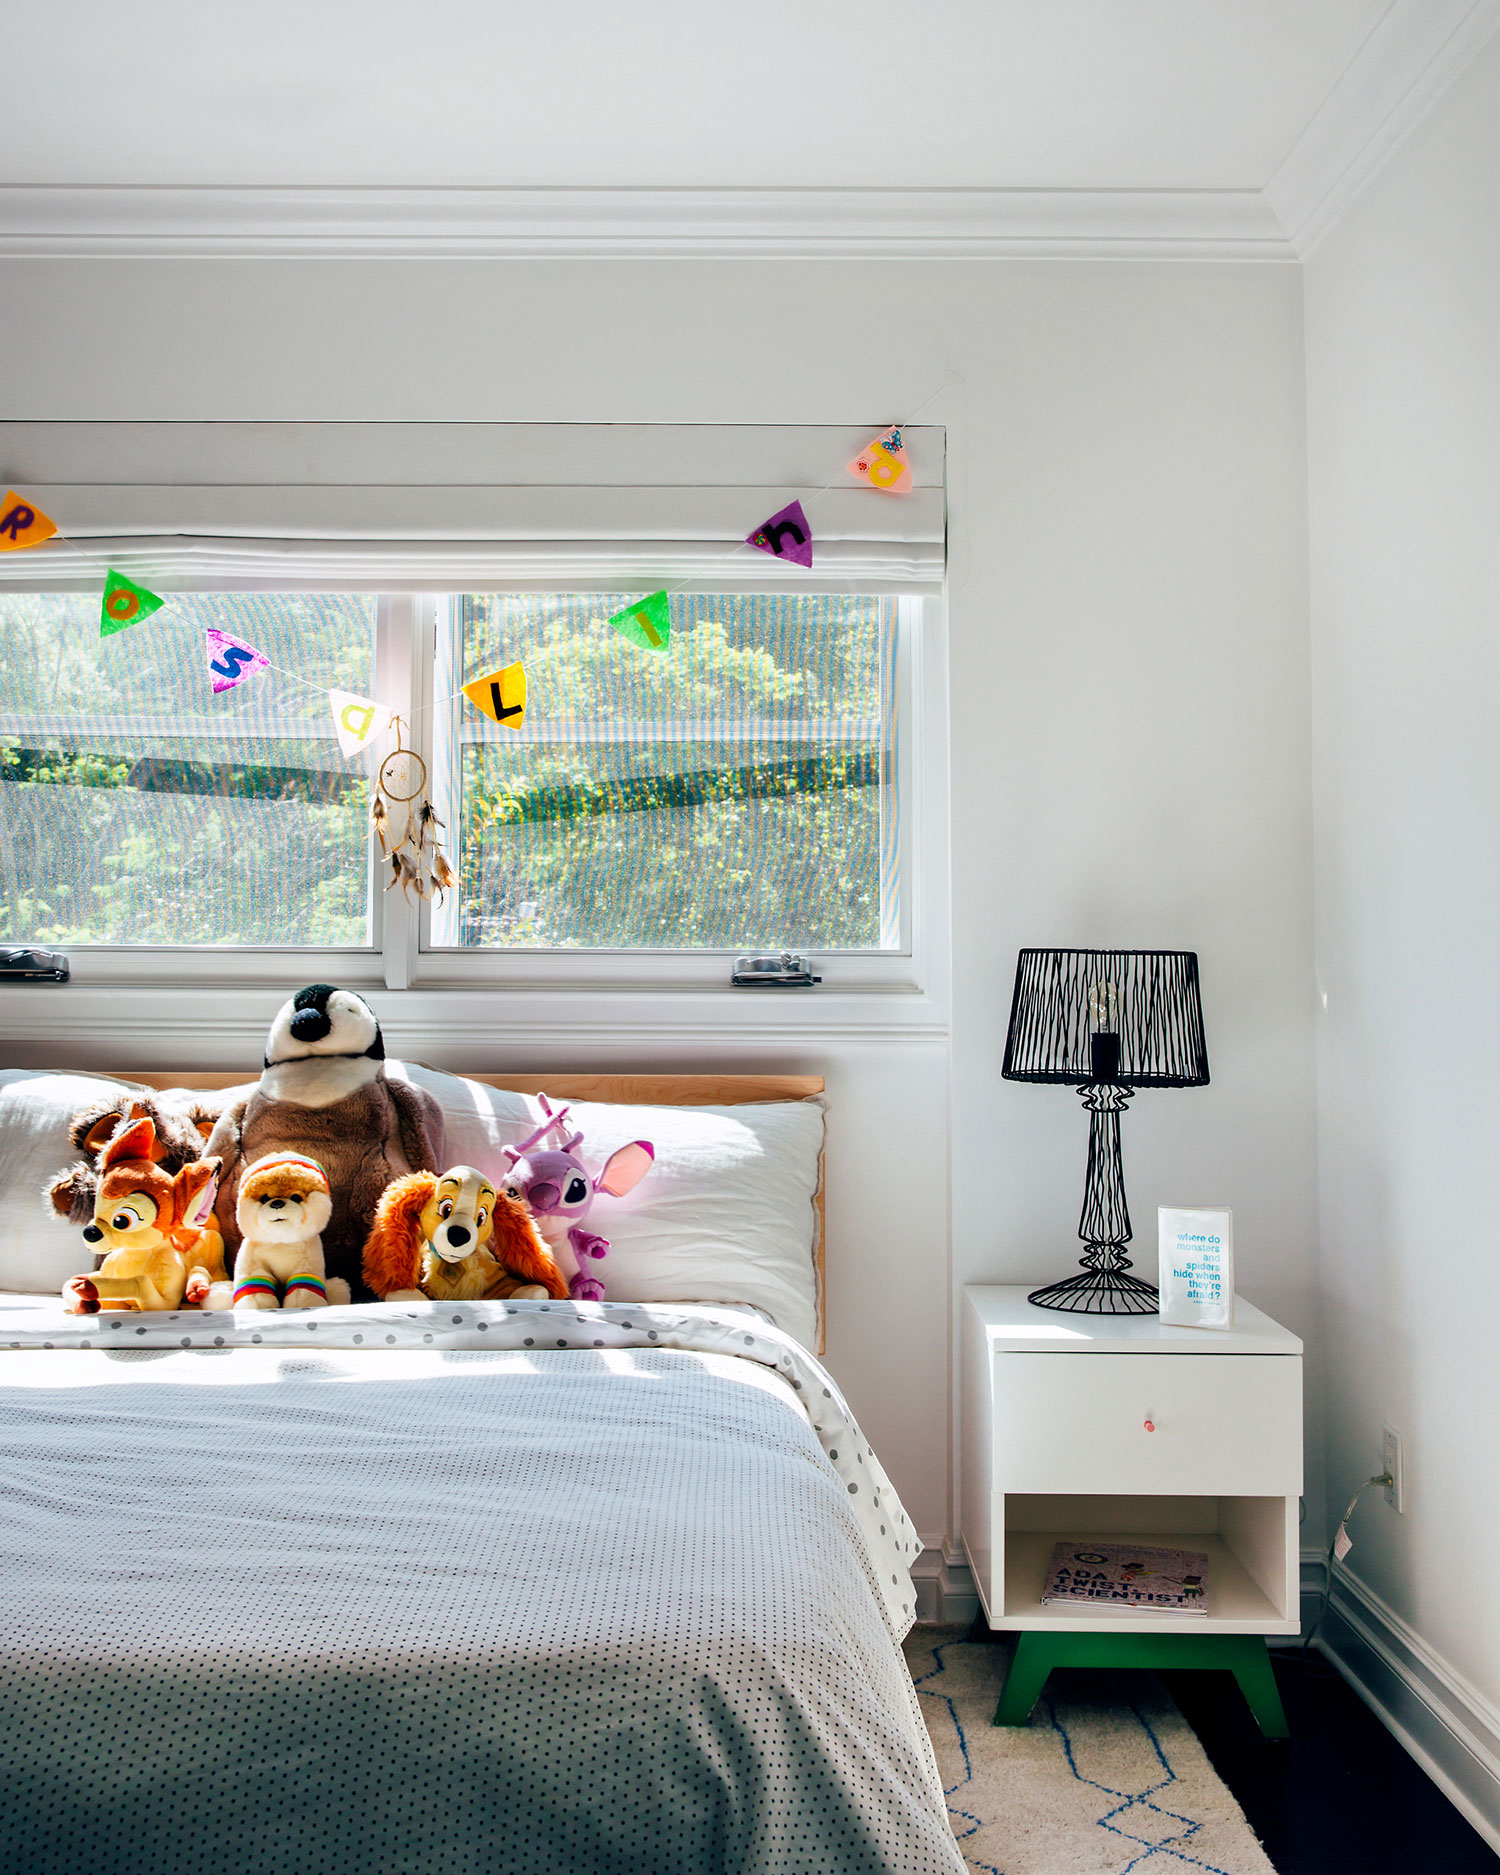 venice-california-child-bedroom.jpg